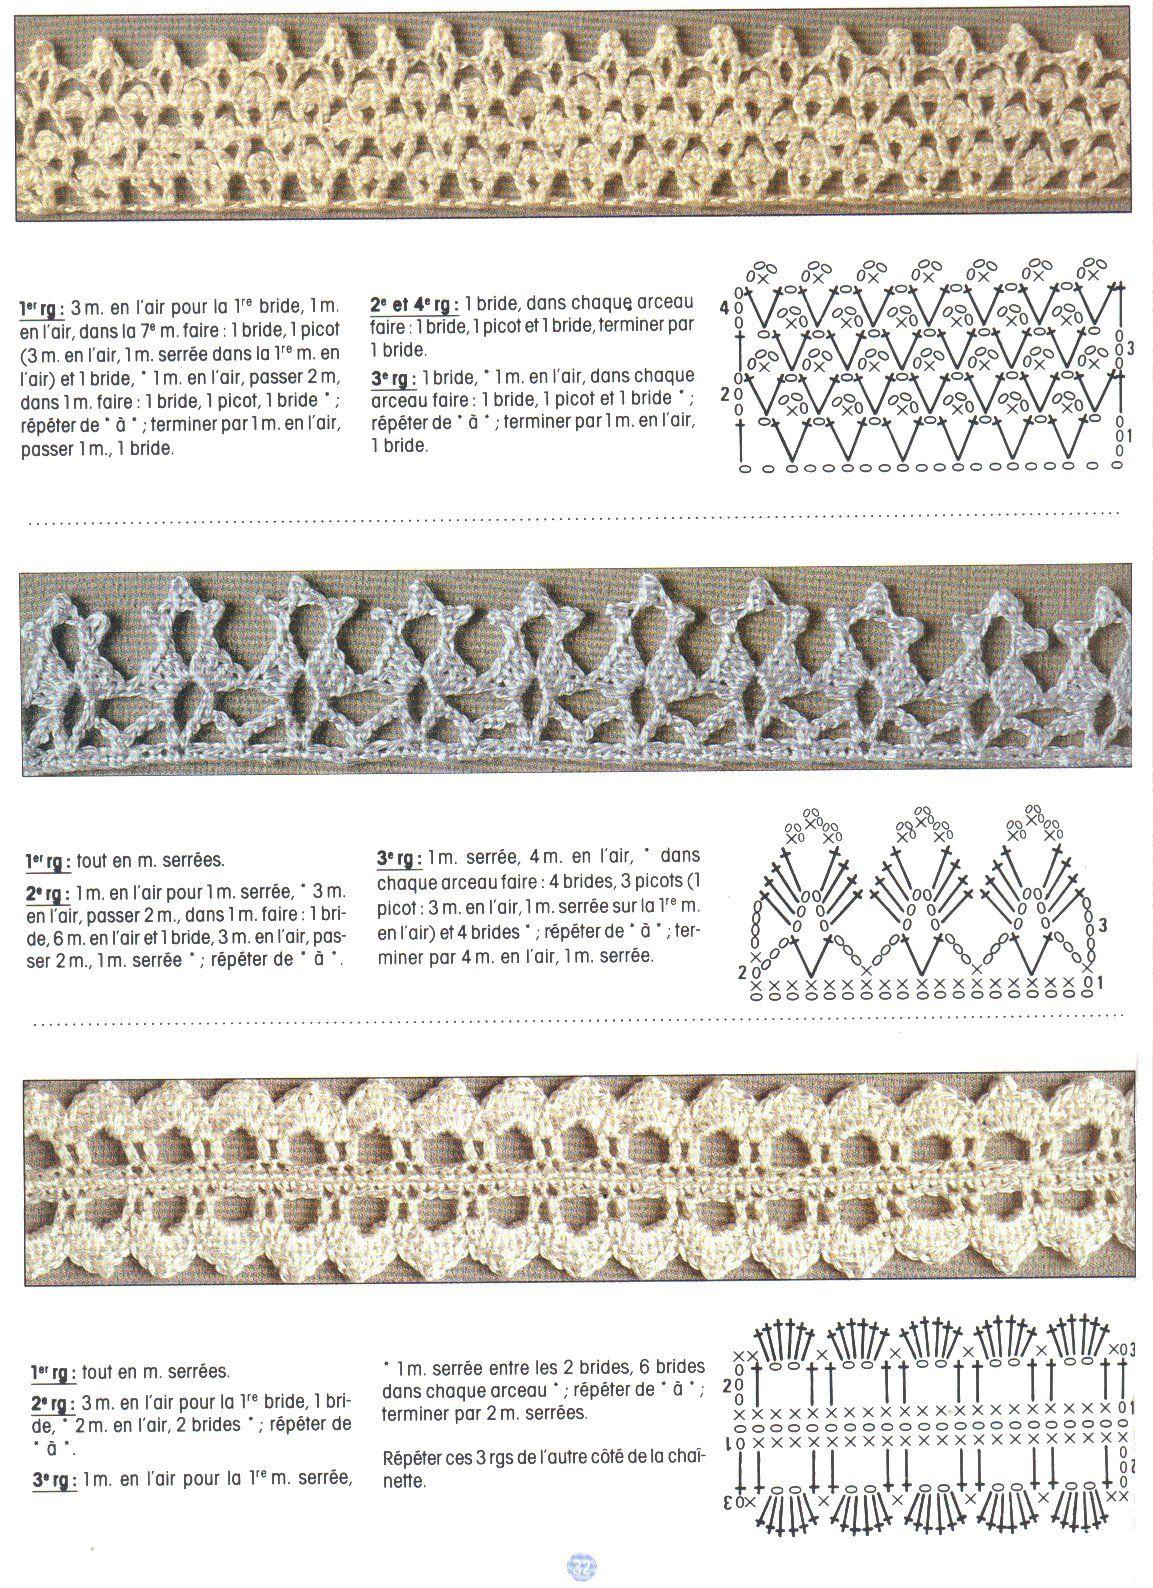 imgbox - fast, simple image host | Crochet. | Pinterest | Ganchillo ...